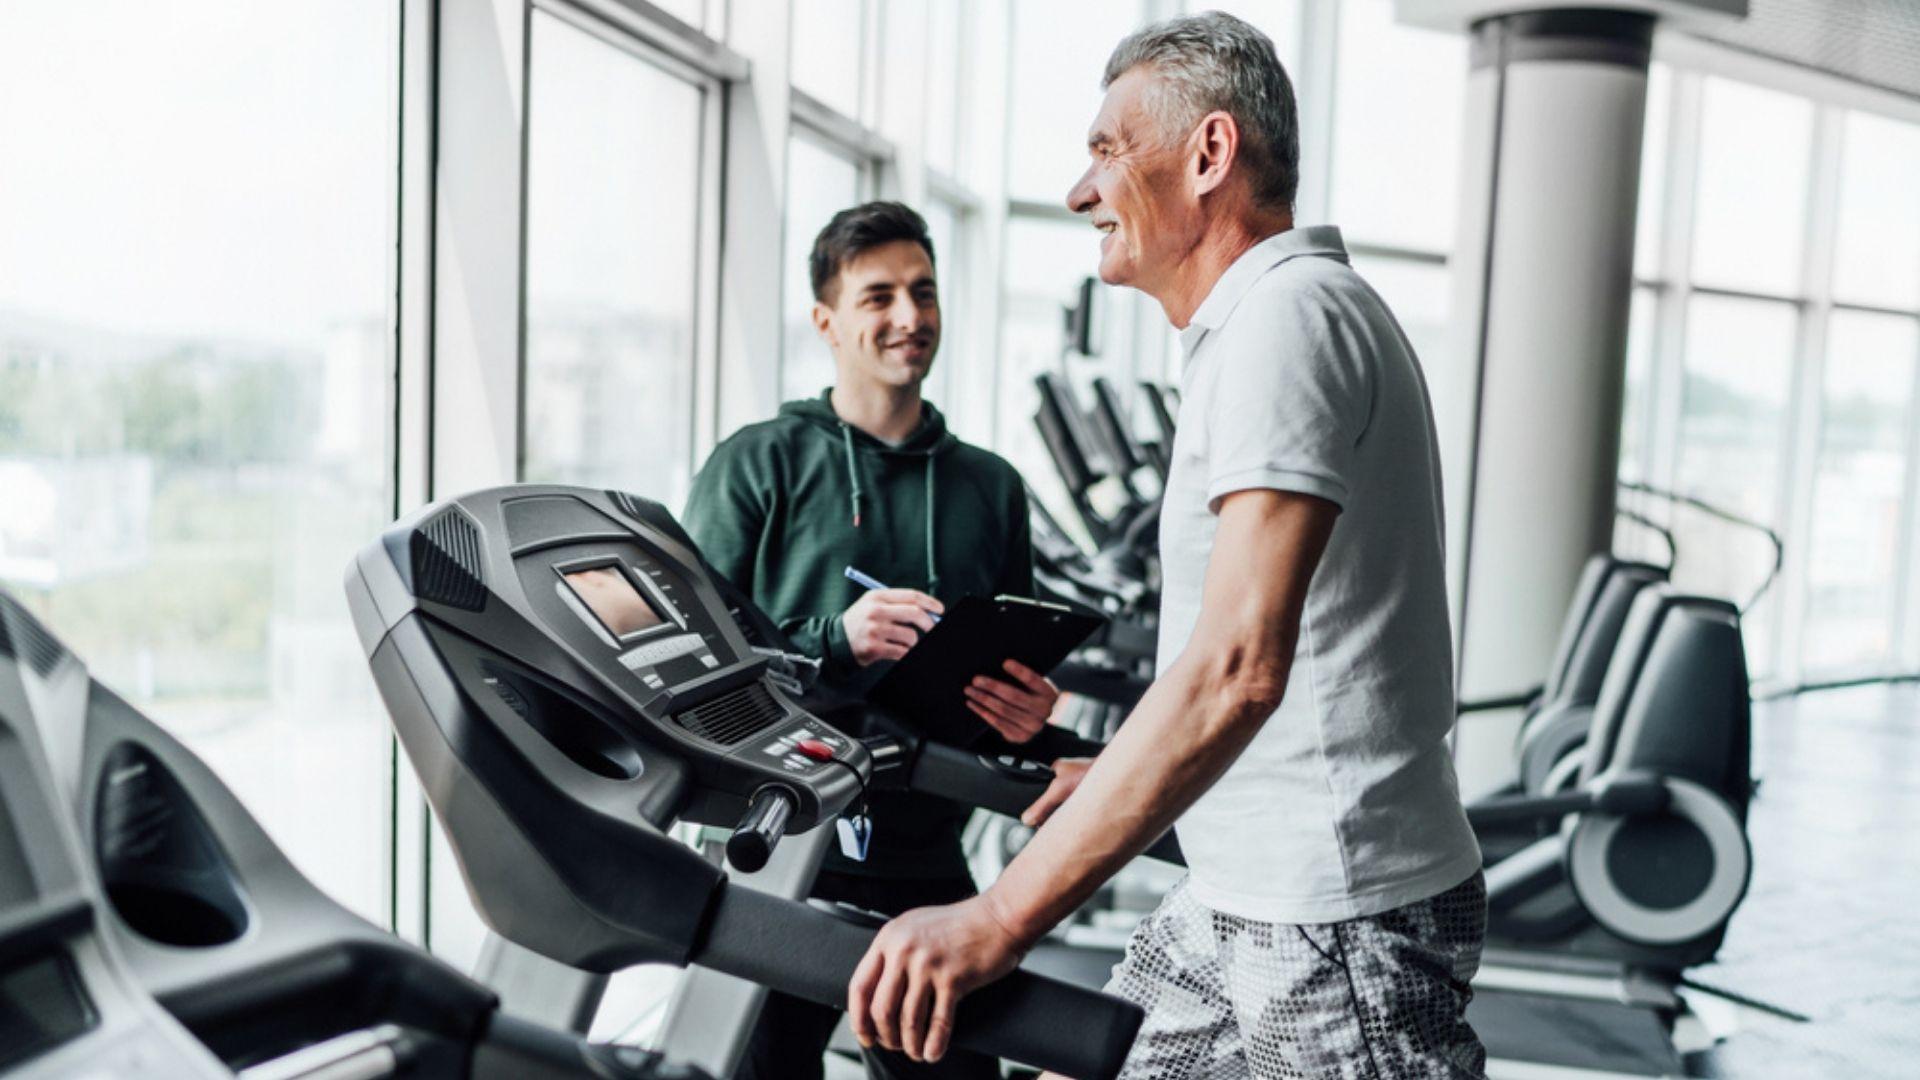 rhythmic auditory stimulation Parkinson's disease Propel Physiotherapy